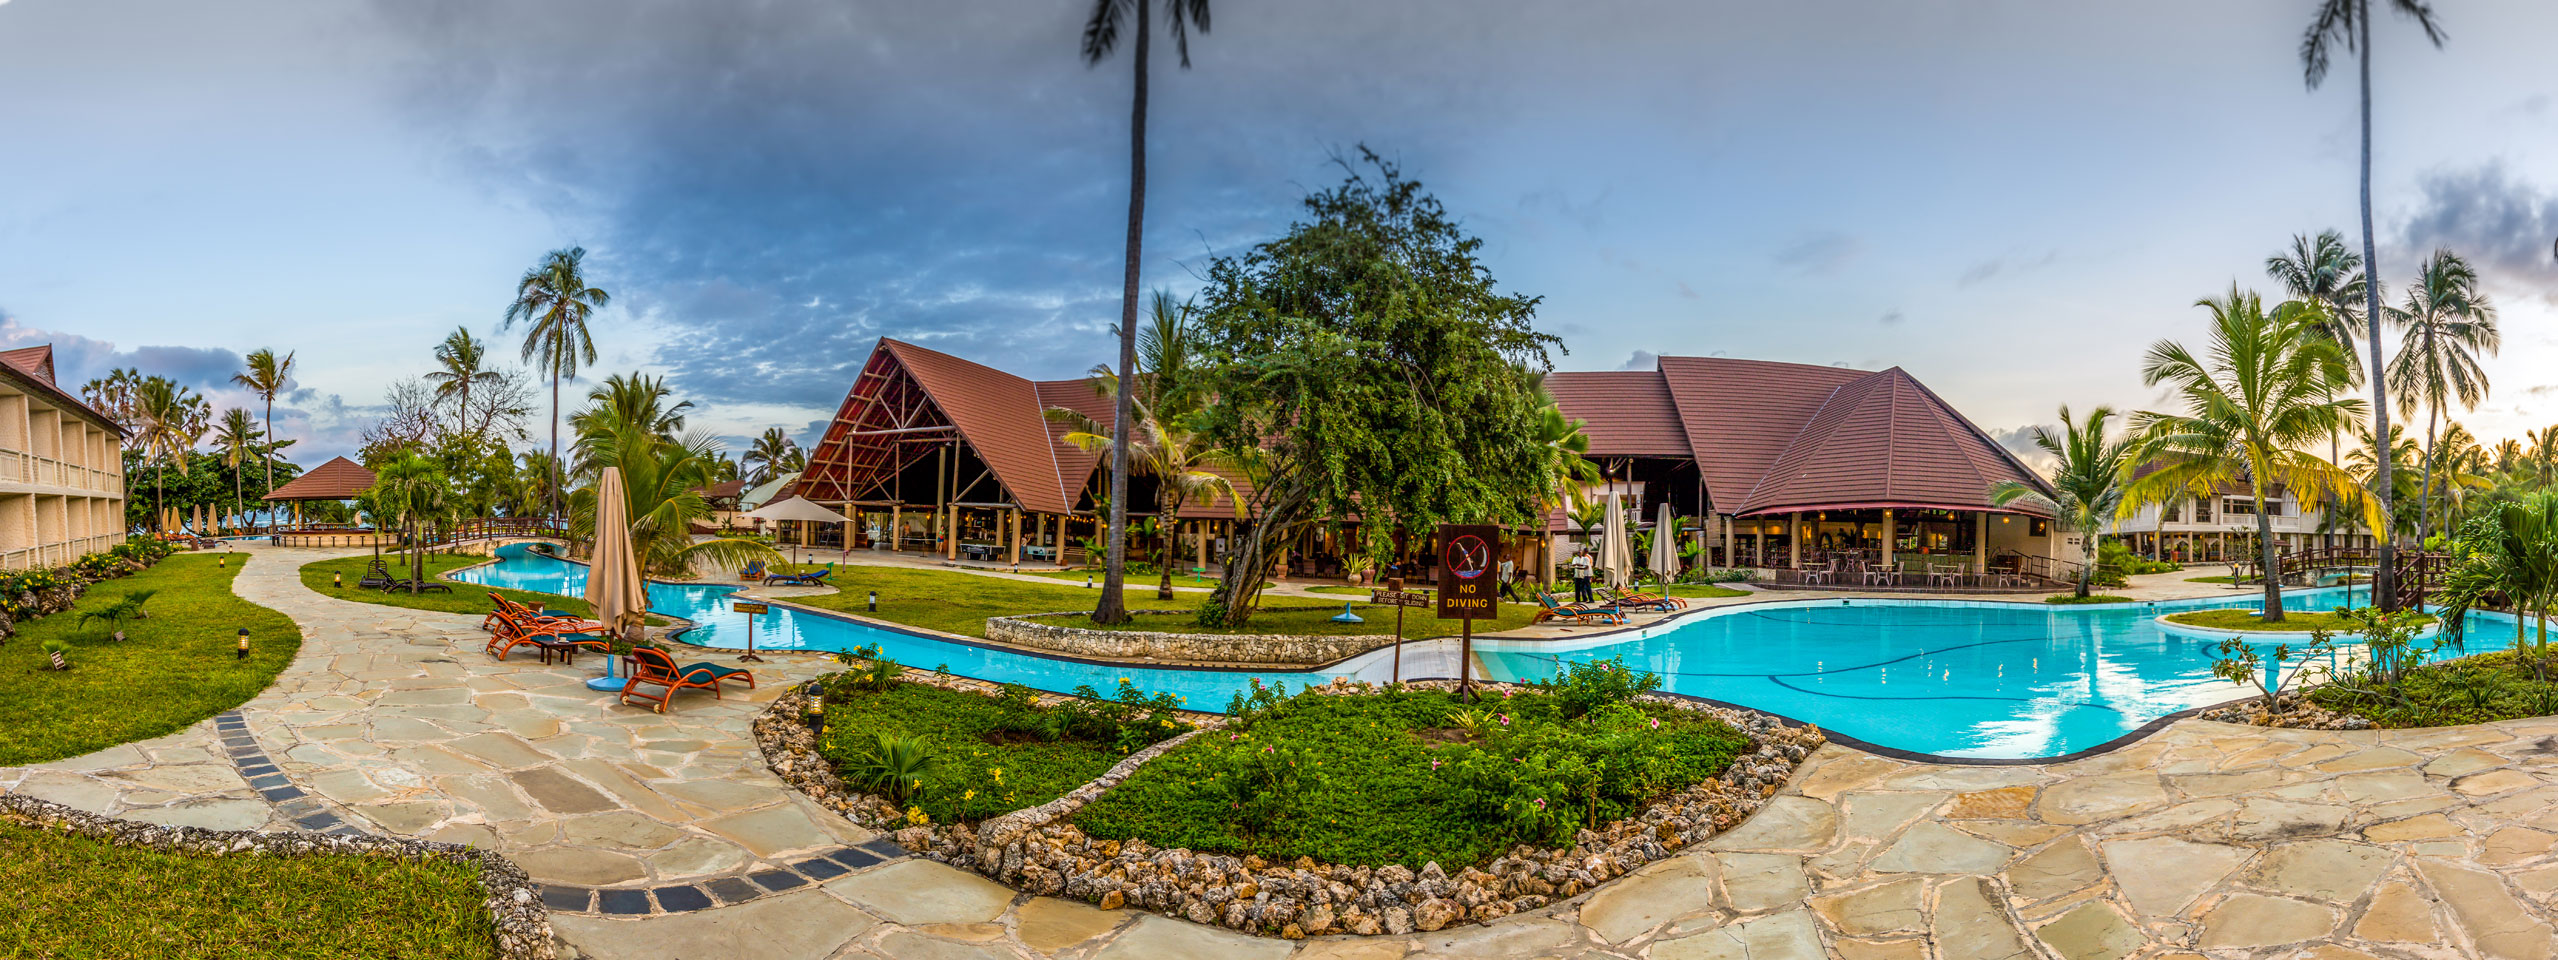 Coast Cottages Amani Tiwi Beach Resort Travel For Change Africa